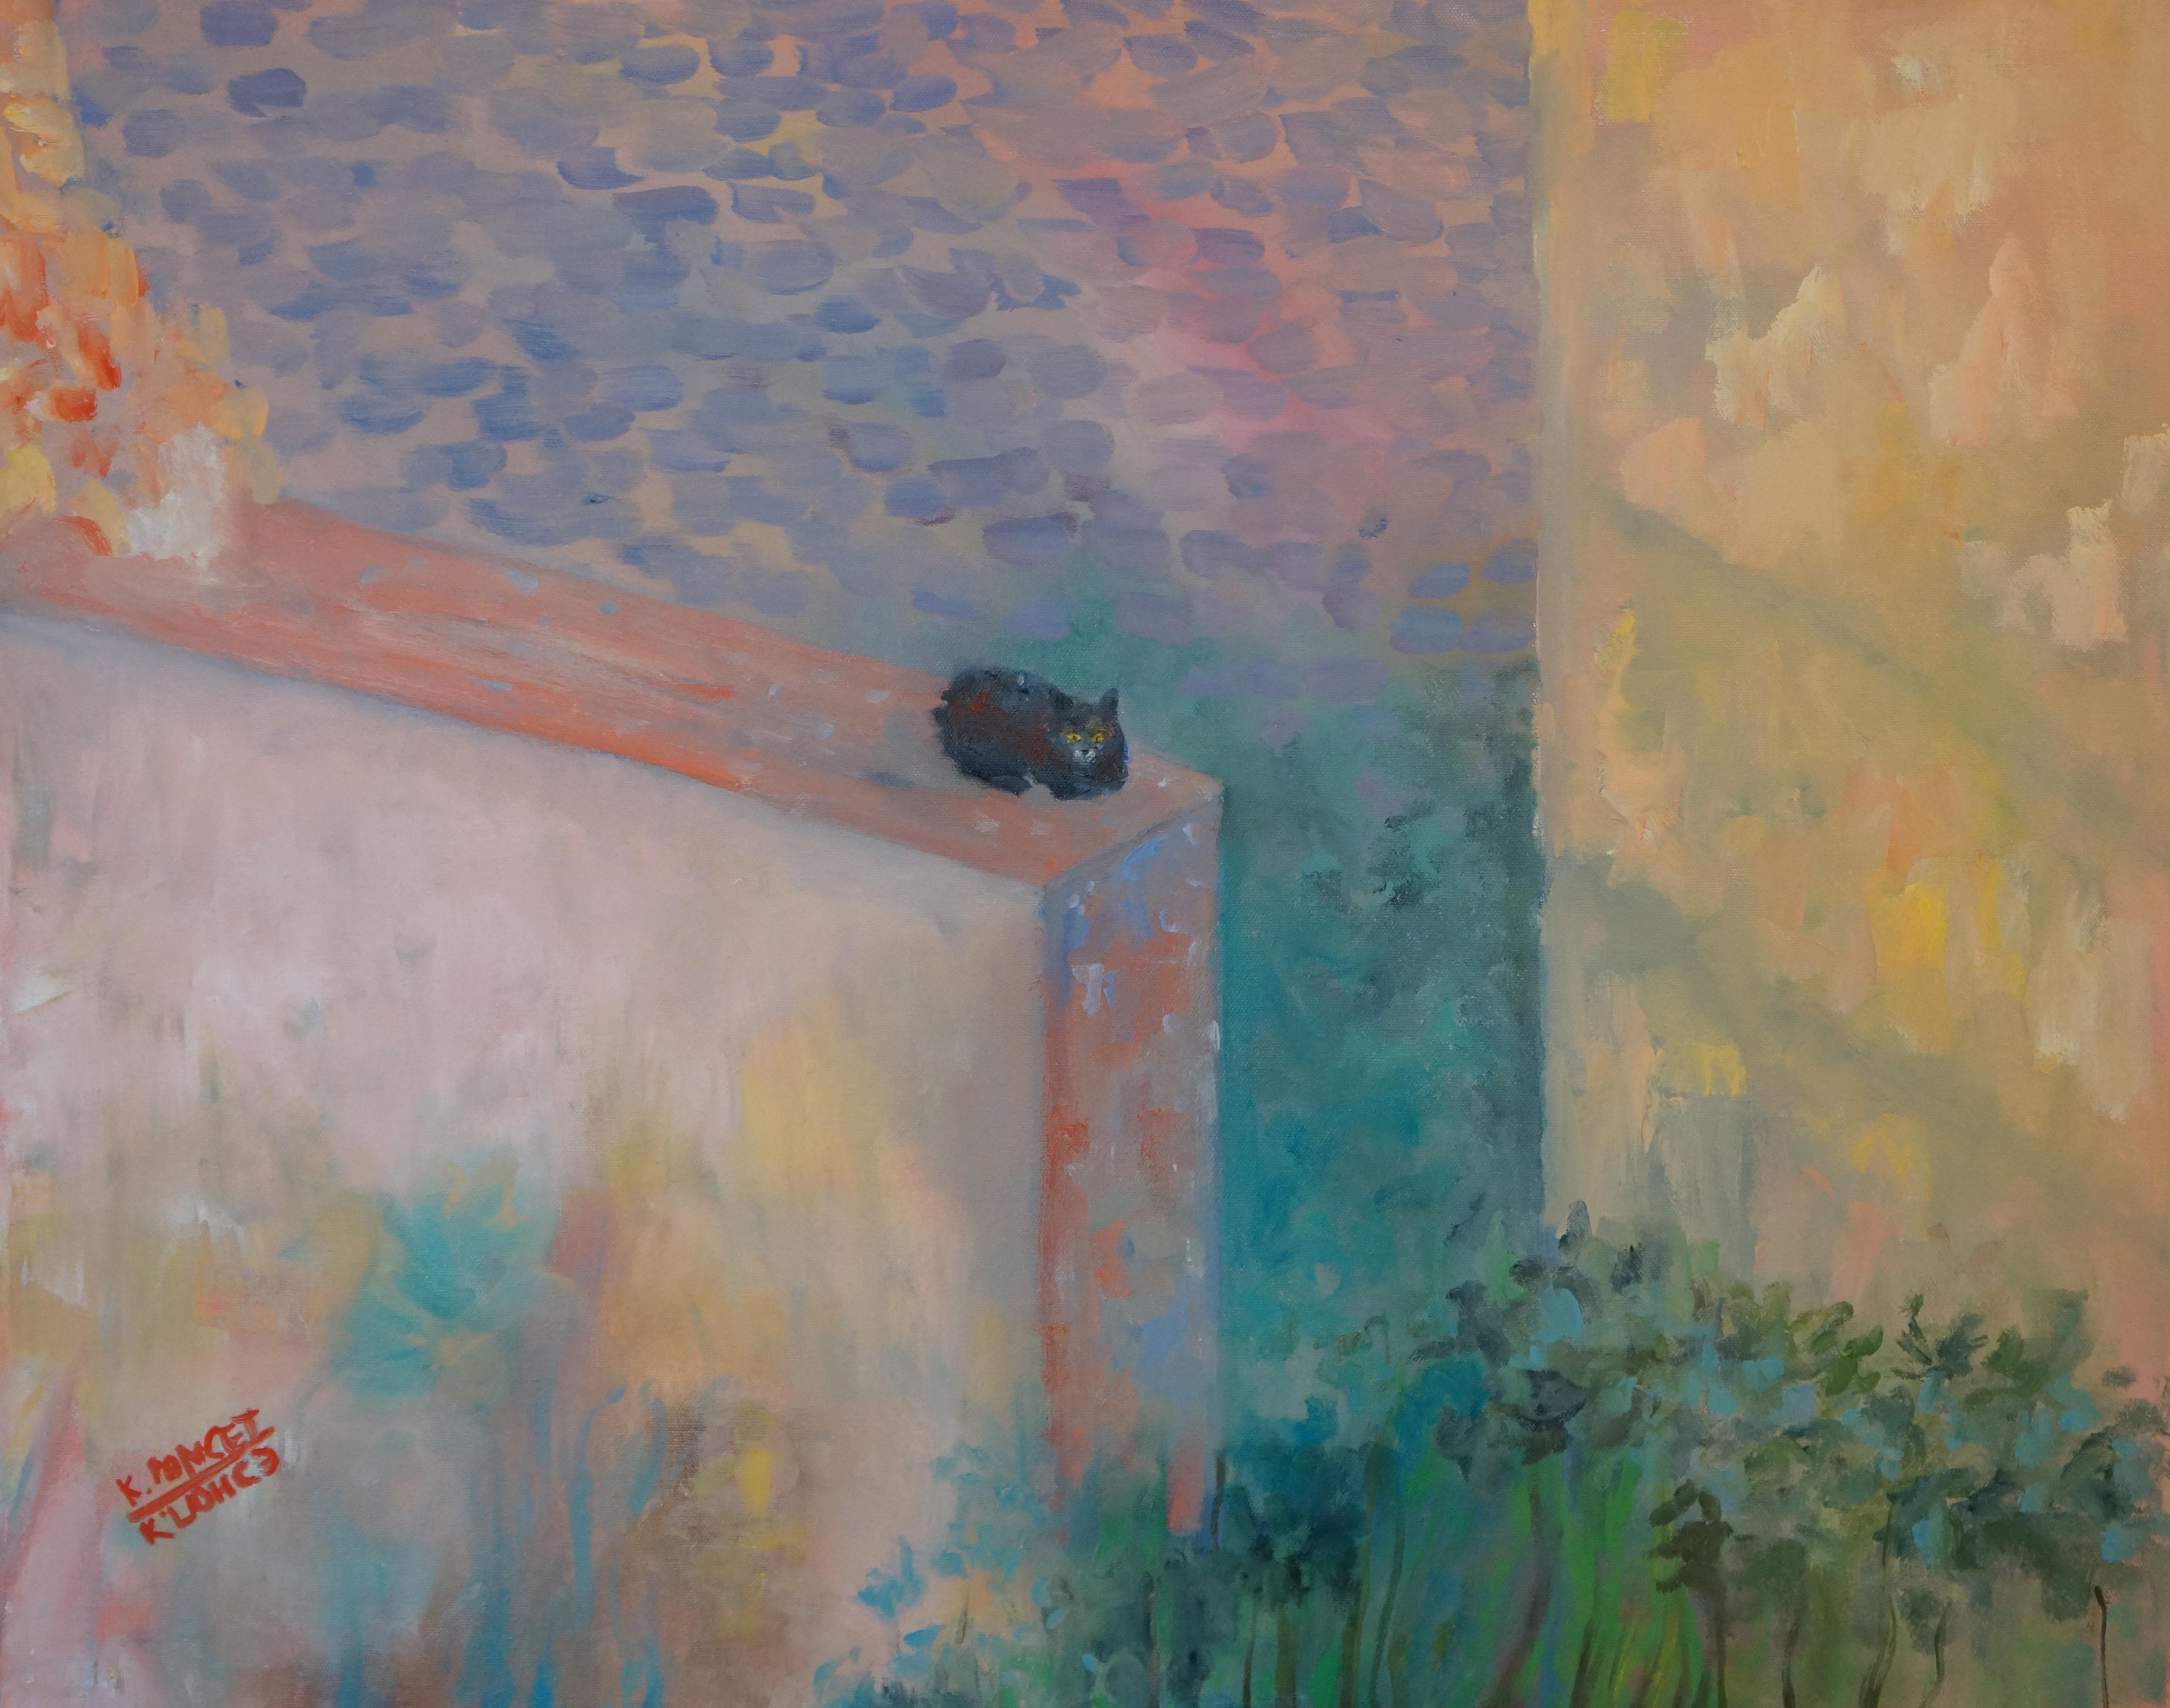 Cat in a wall in Dubrovnik